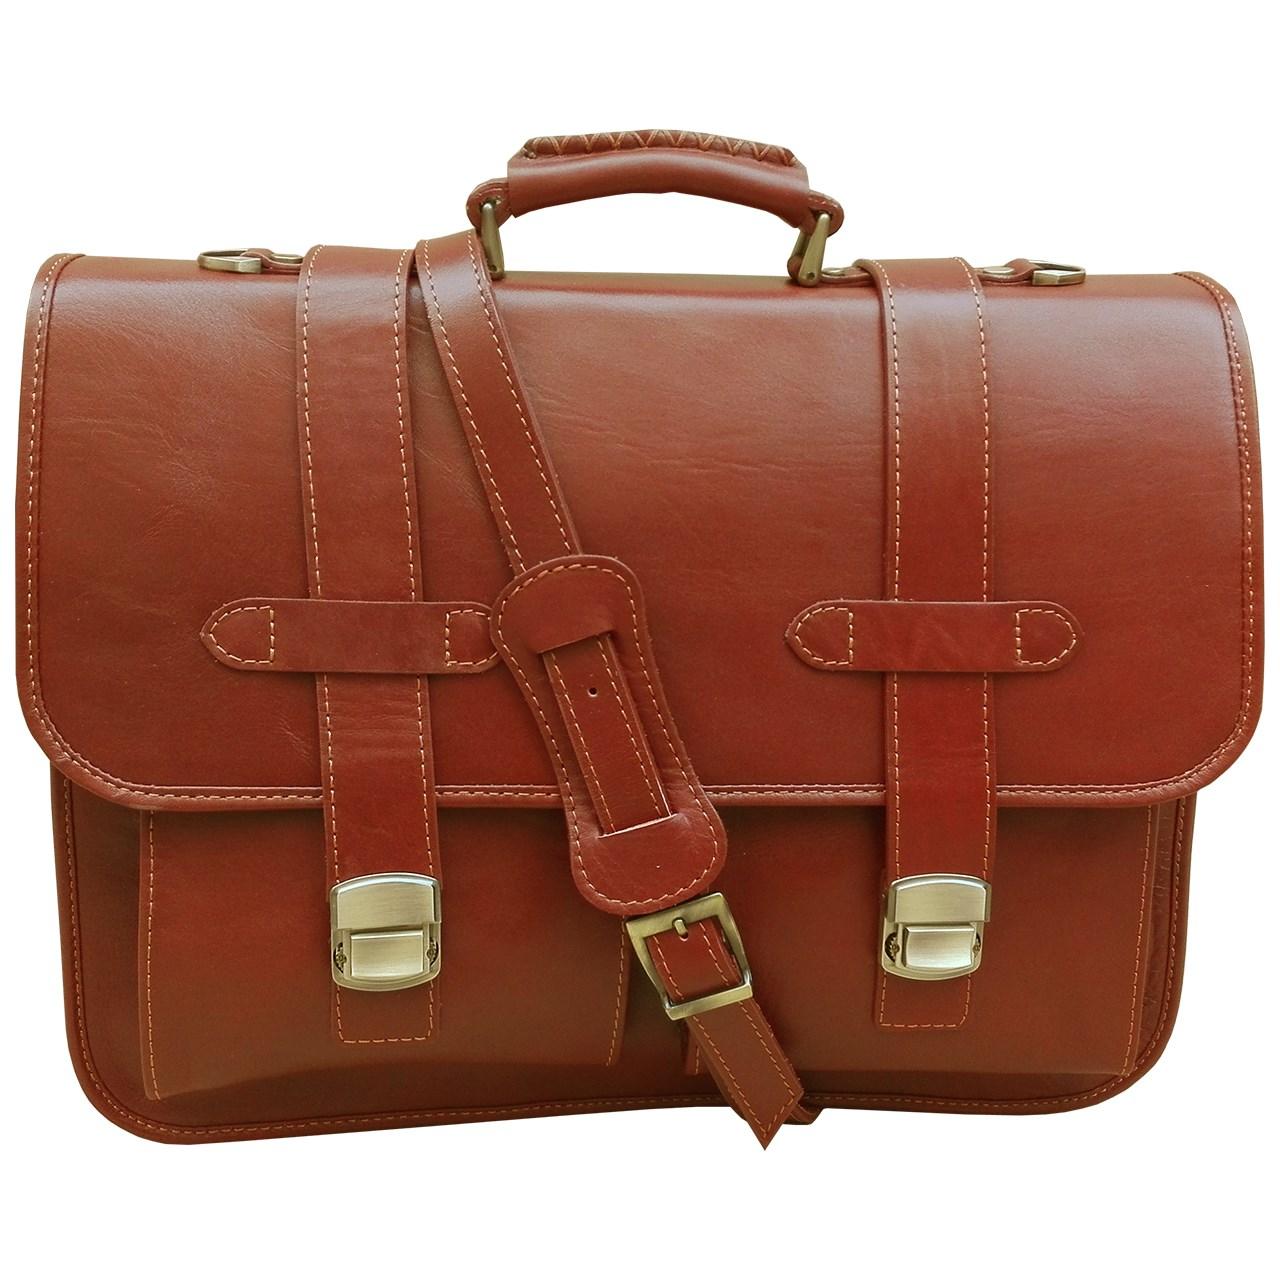 کیف چرم طبیعی دیاکو مدل 126